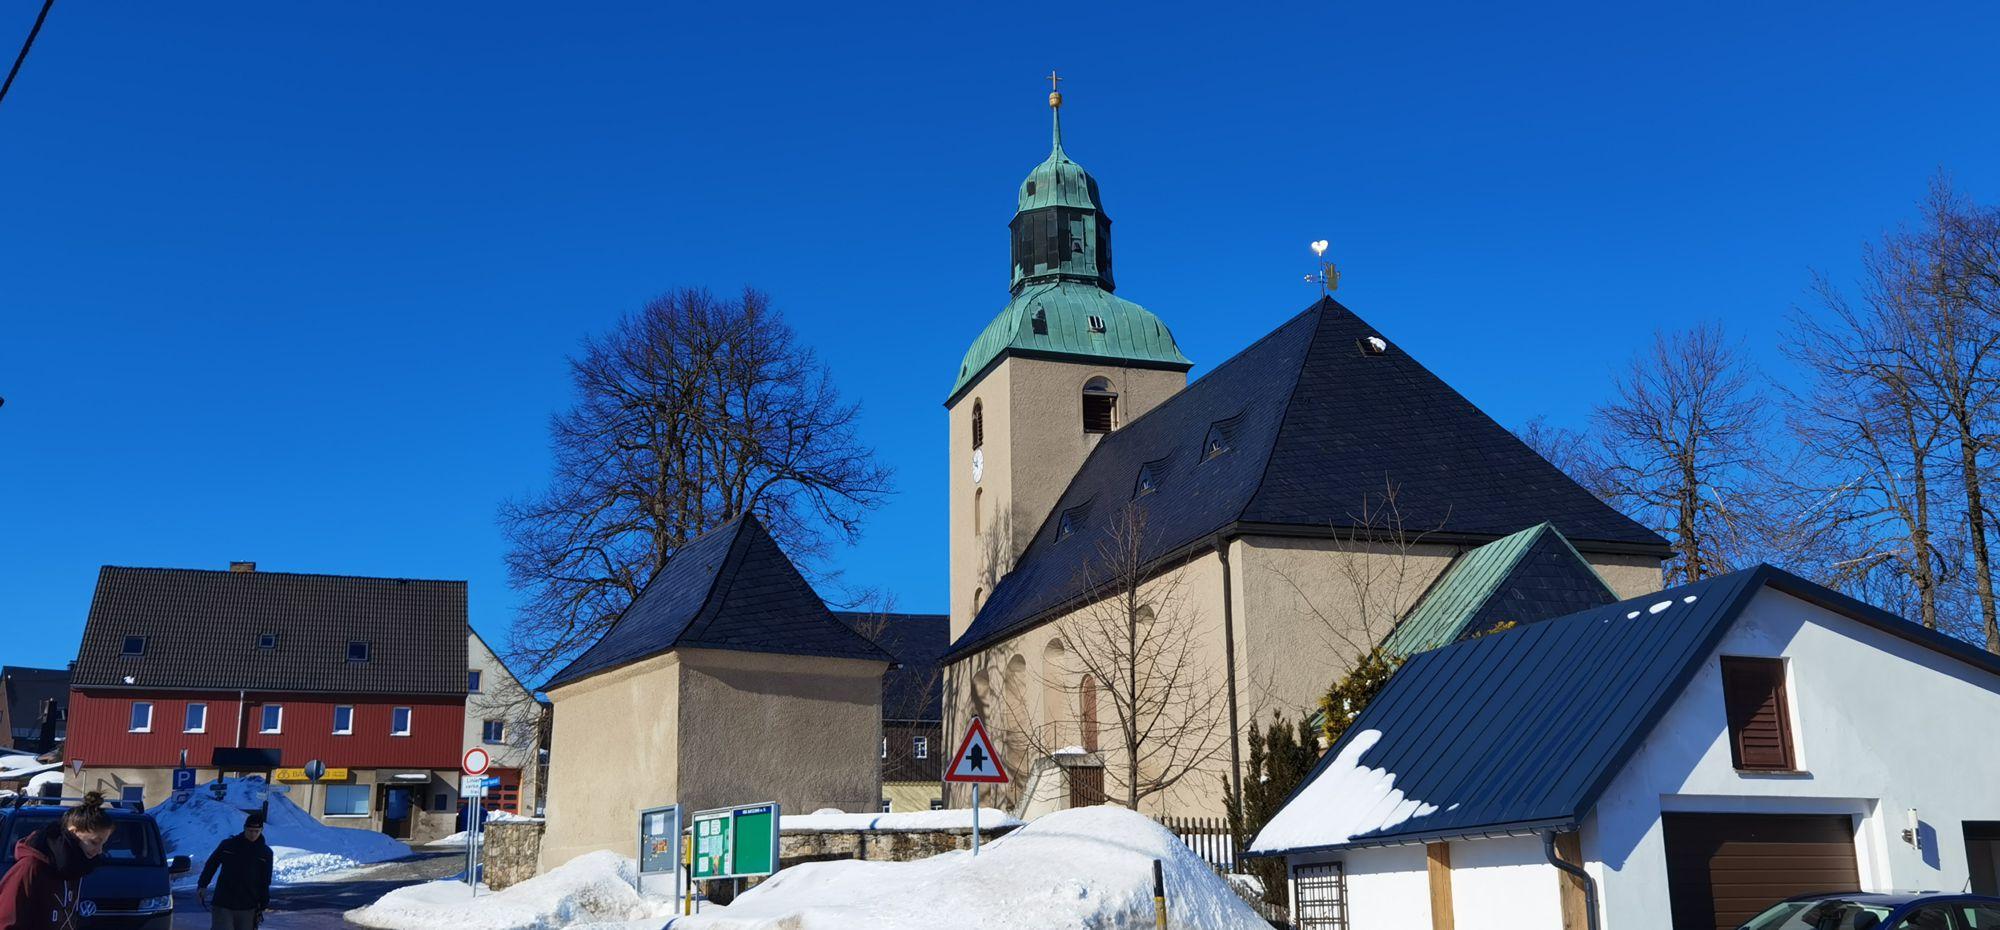 Satzung Erzgebirge